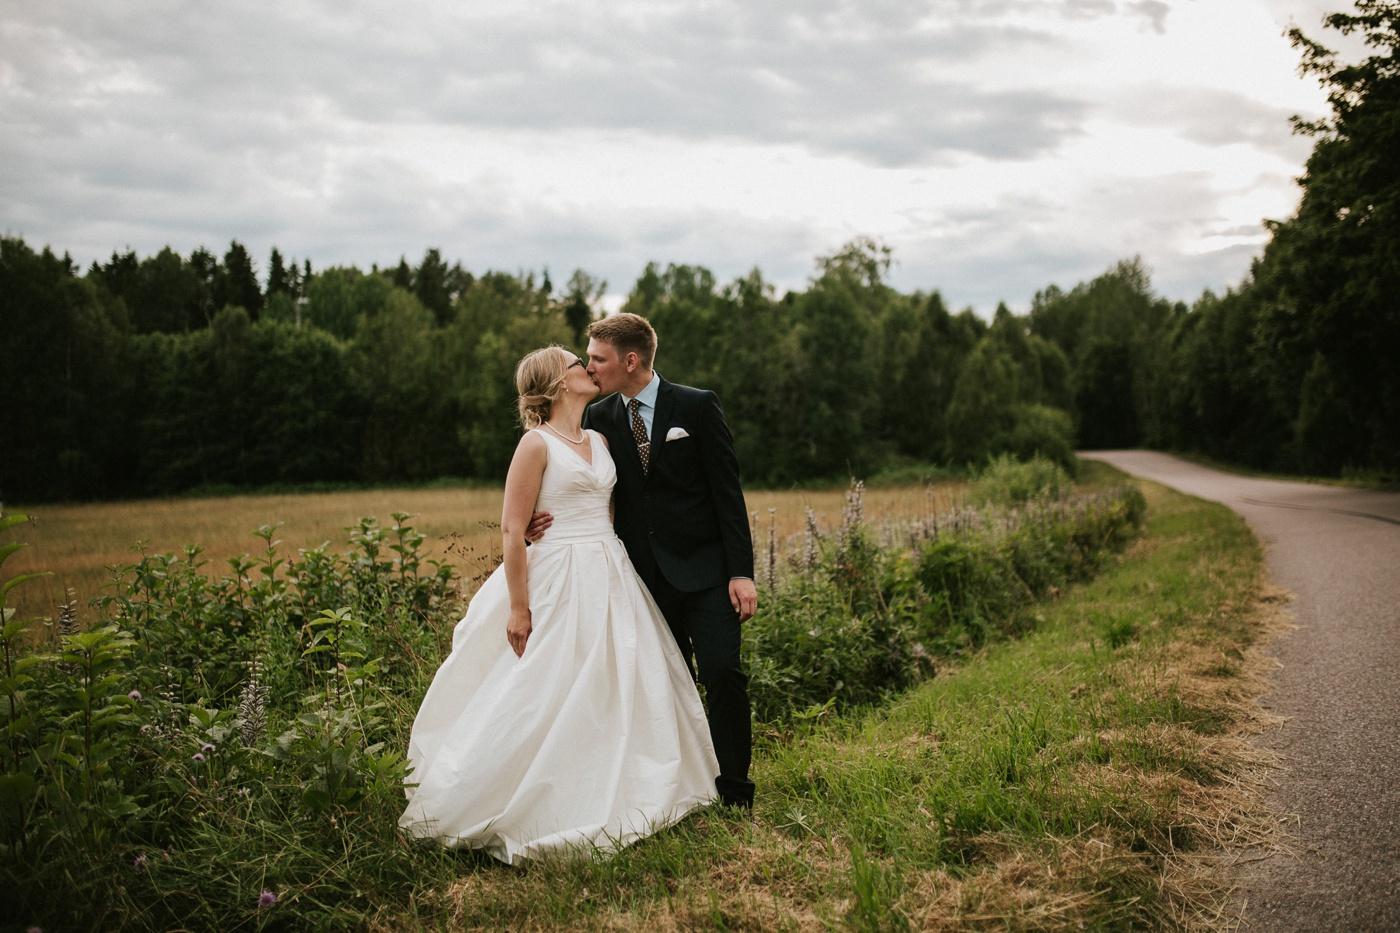 ceciliajoakim_sweden-countryside-summer-wedding_melbourne-fun-quirky-wedding-photography_89